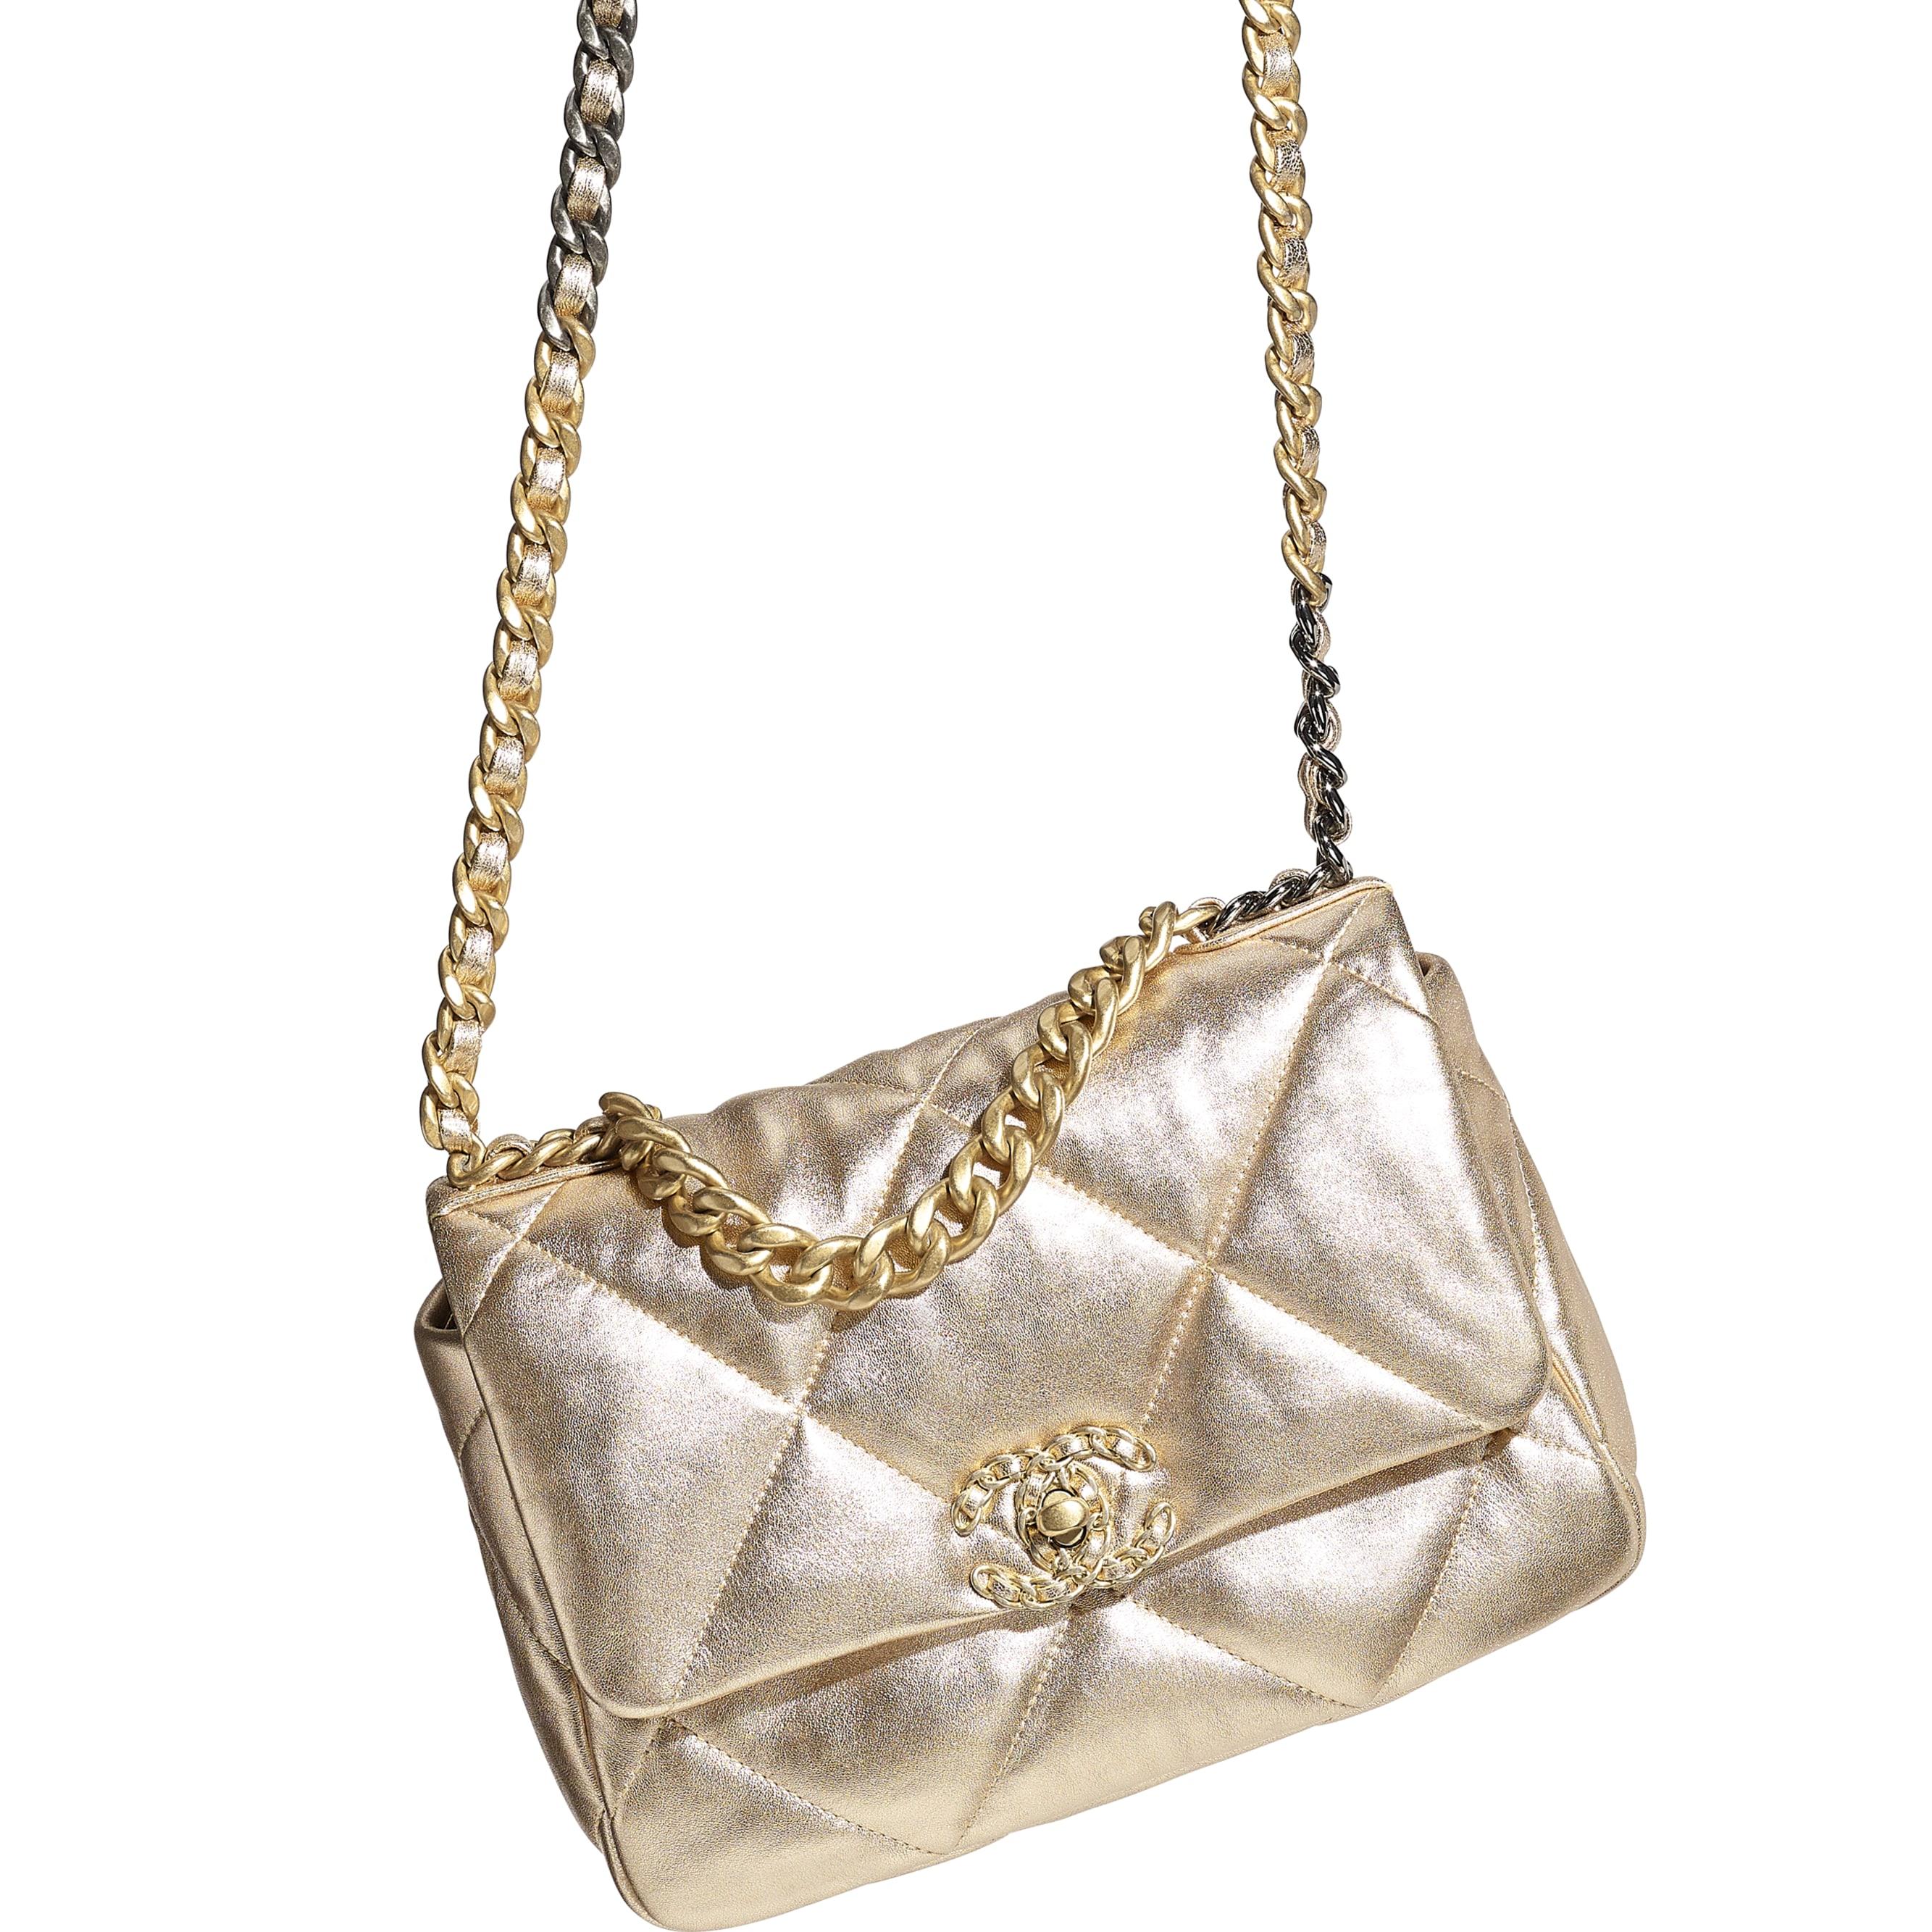 CHANEL 19 Handbag - Gold - Metallic Lambskin, Gold-Tone, Silver-Tone & Ruthenium-Finish Metal - CHANEL - Extra view - see standard sized version